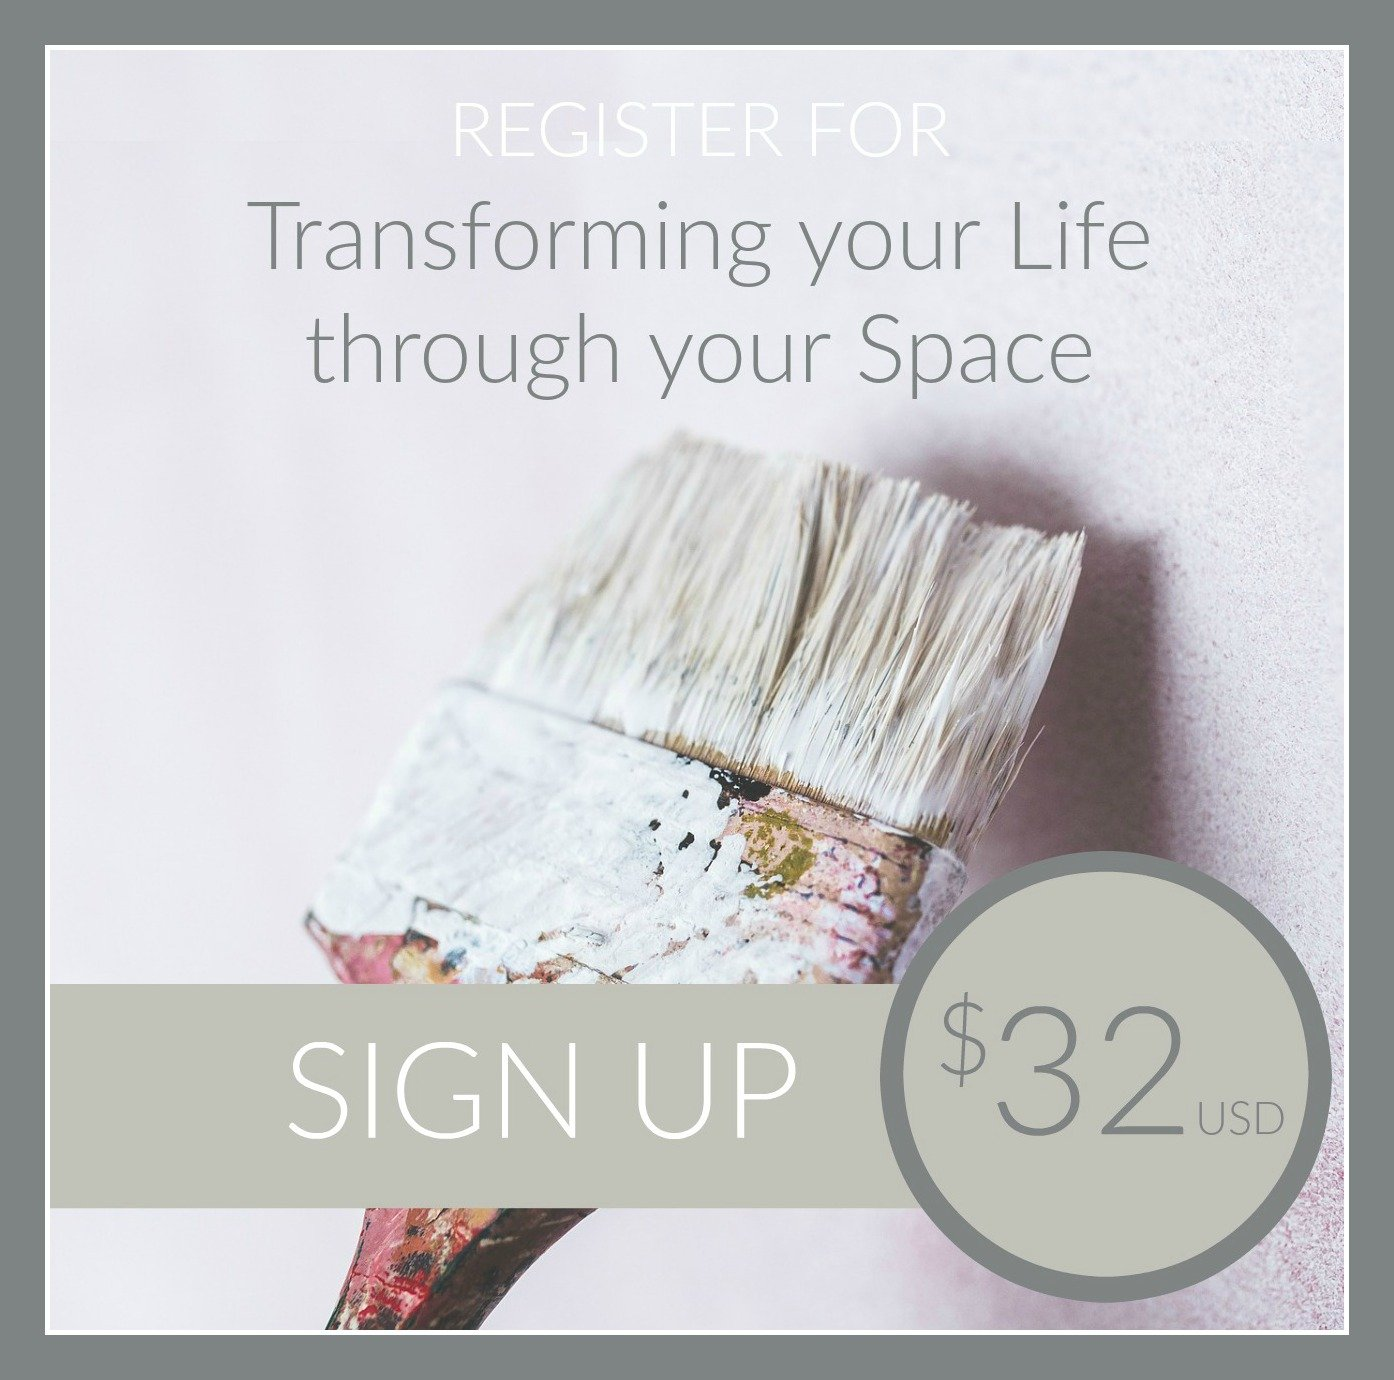 transforming $2